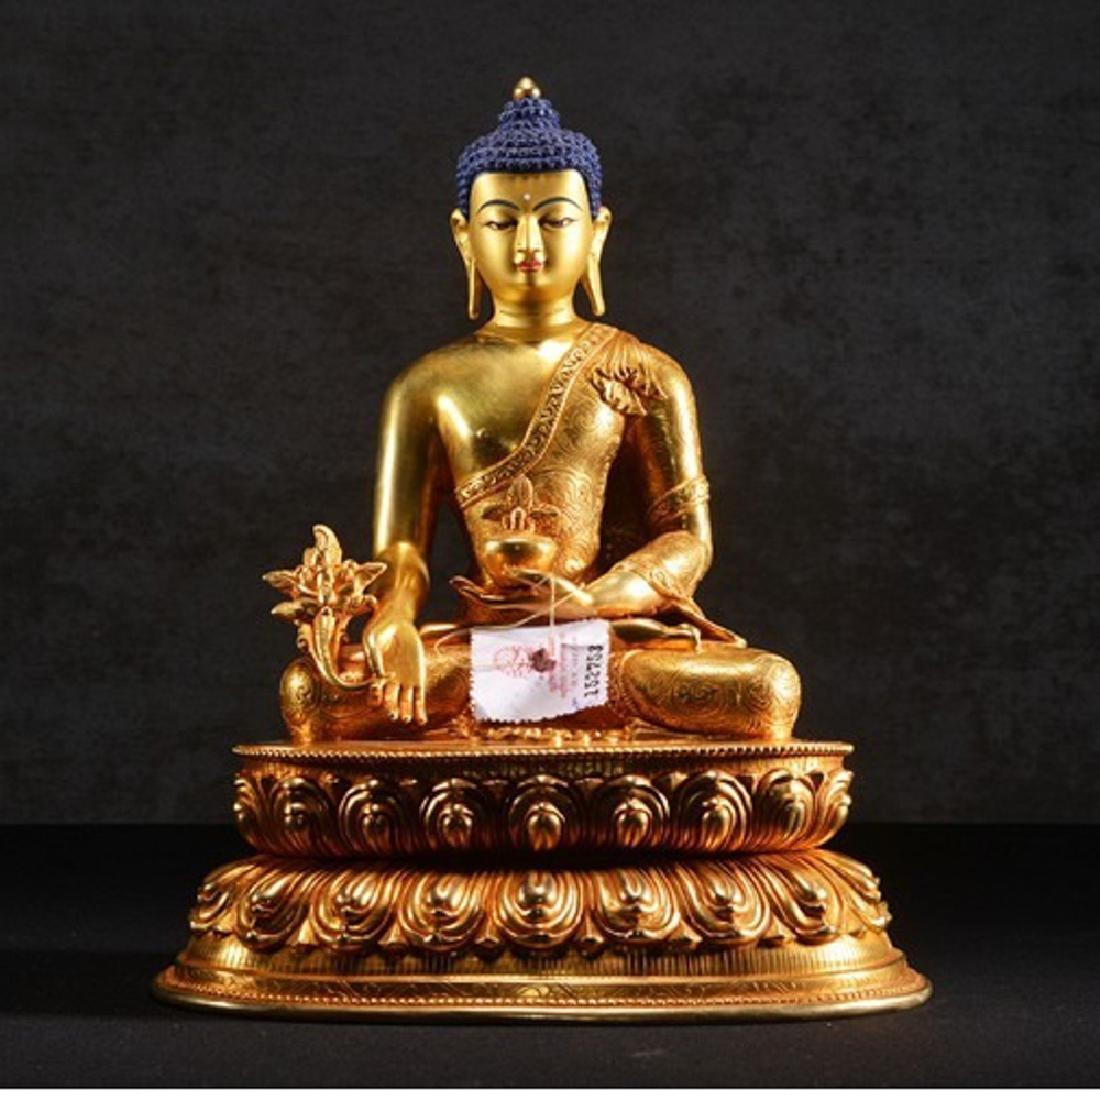 THE GILT BRONZE OF BUDDHA